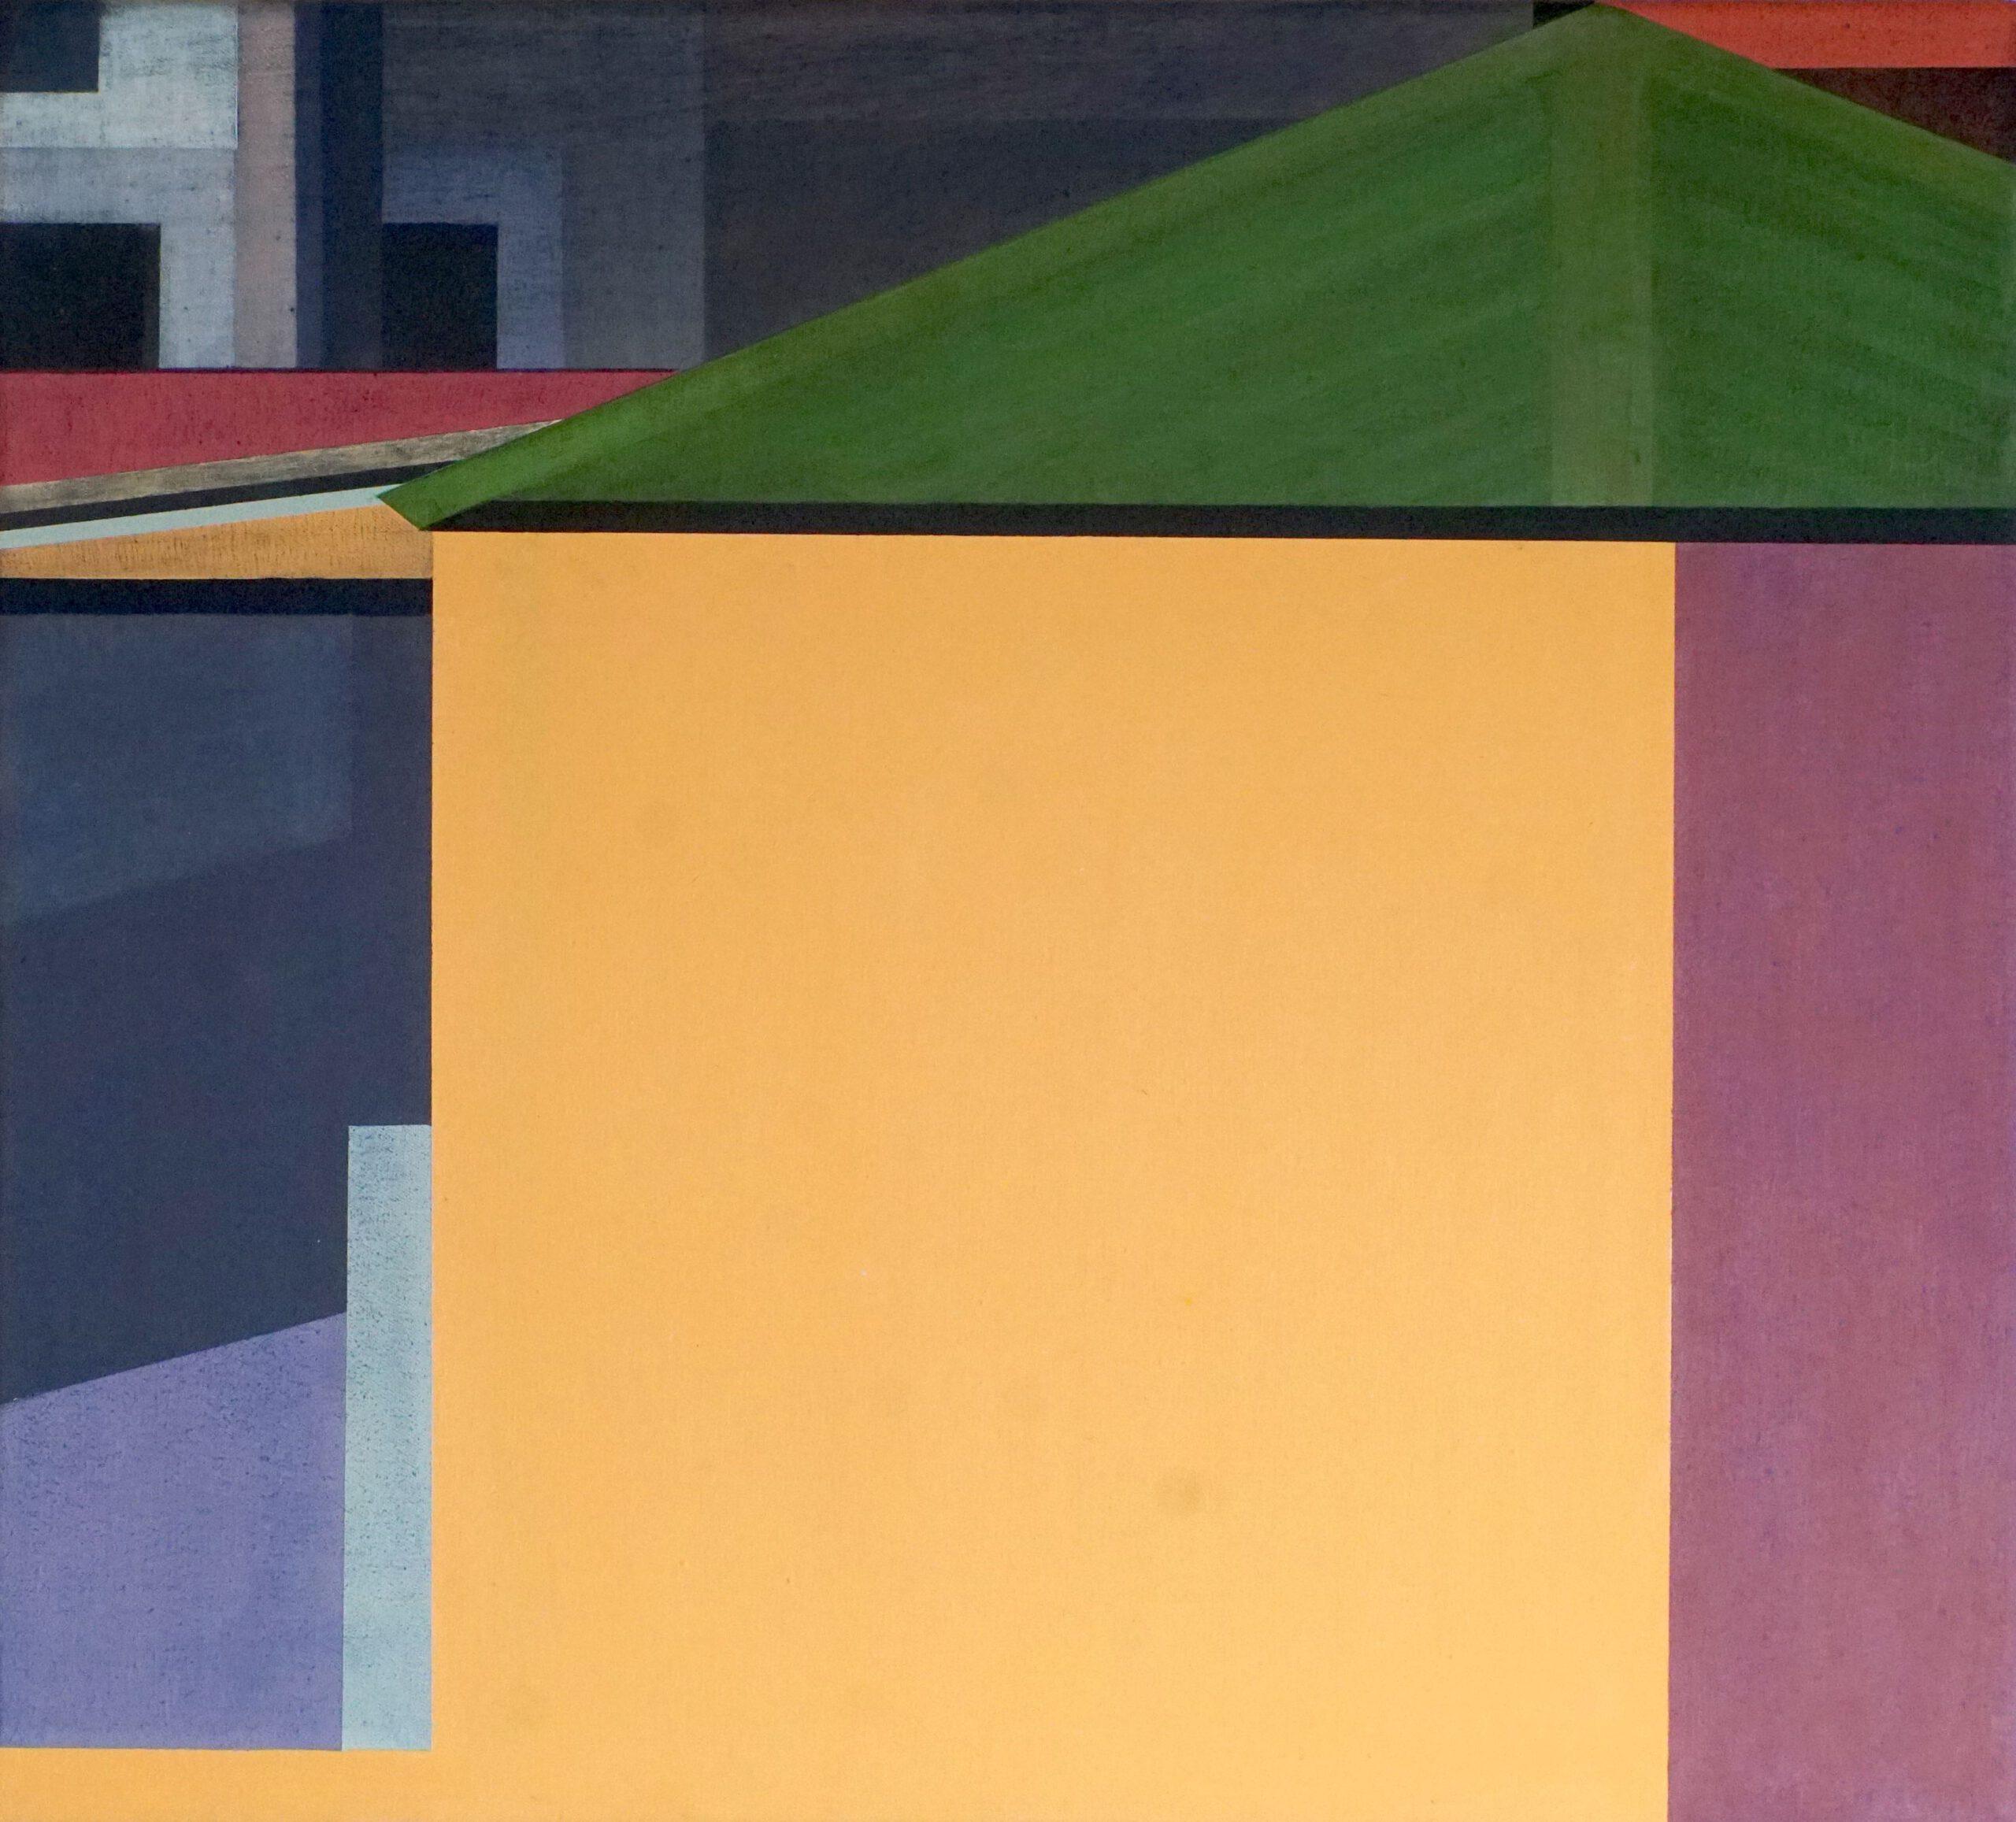 Manila V, 2020, 45 x 50 cm, Öl/Lw, Oil on Canvas